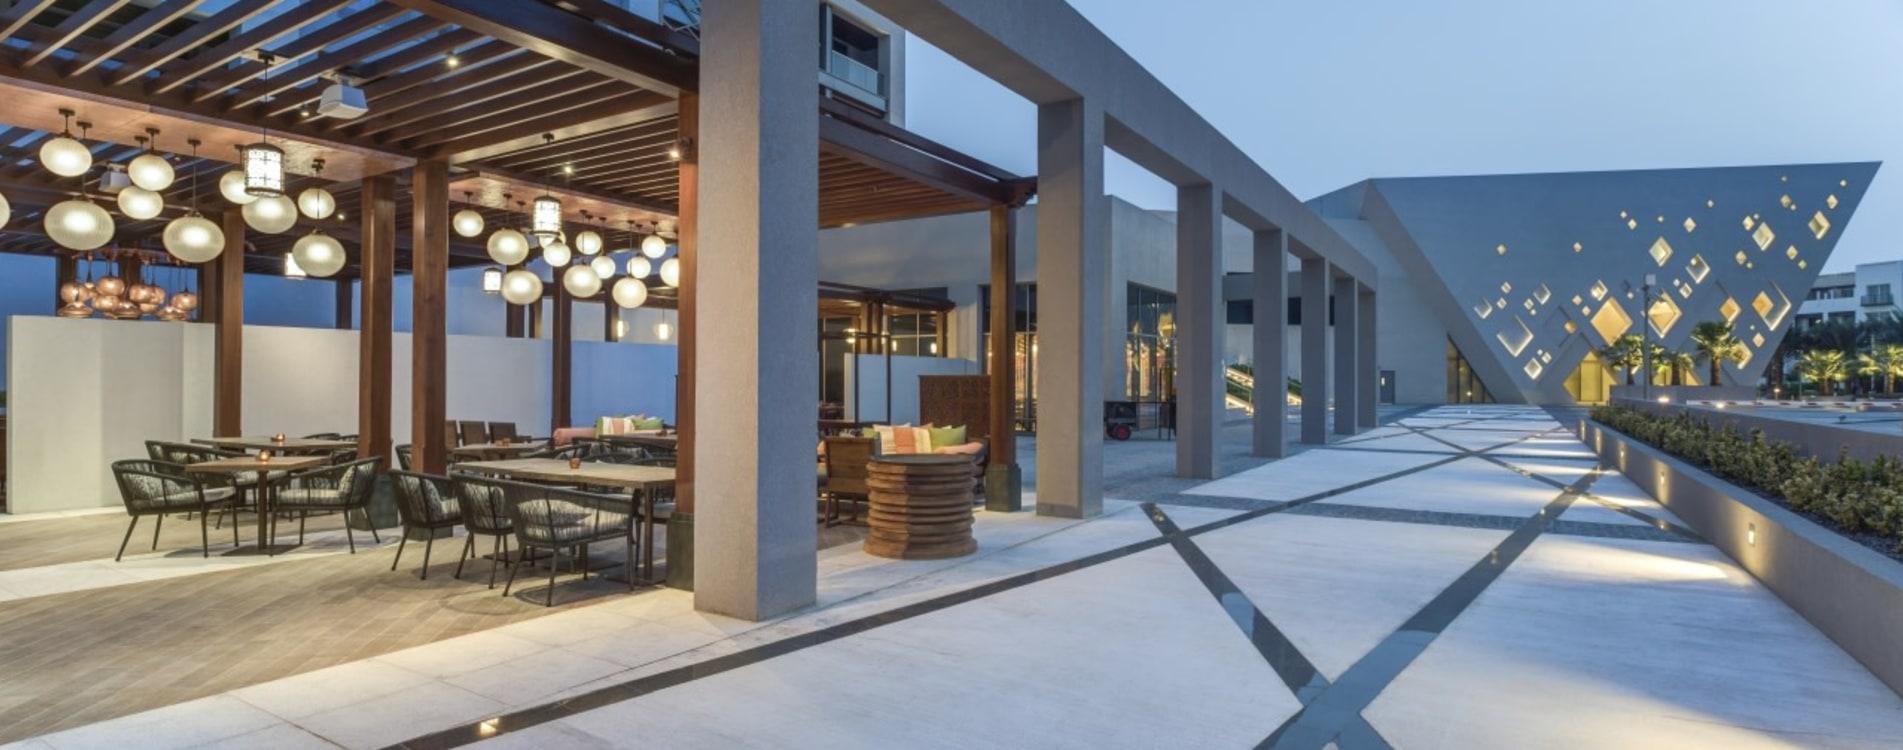 Kempinski-Hotel-Muscat-Boulevard-Tea-House-Terrasse-Oman.jpg